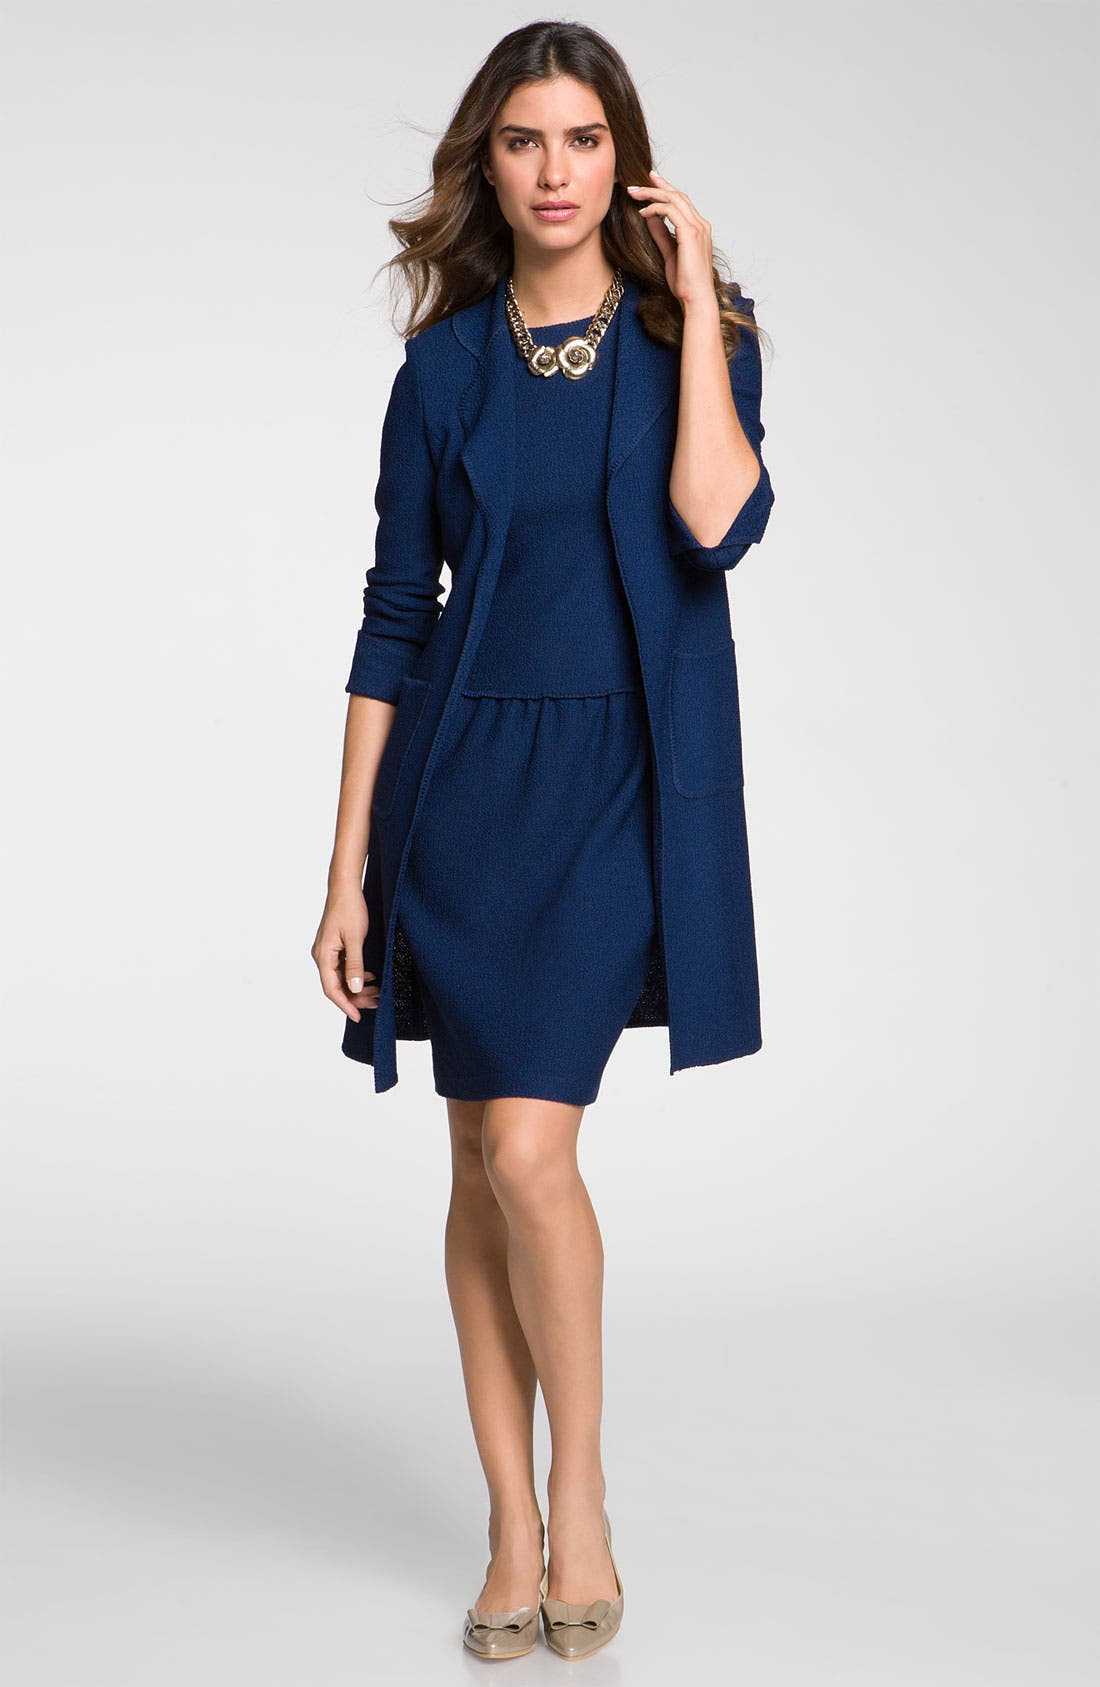 Alternate Image 1 Selected - St. John Collection Topper & Dress